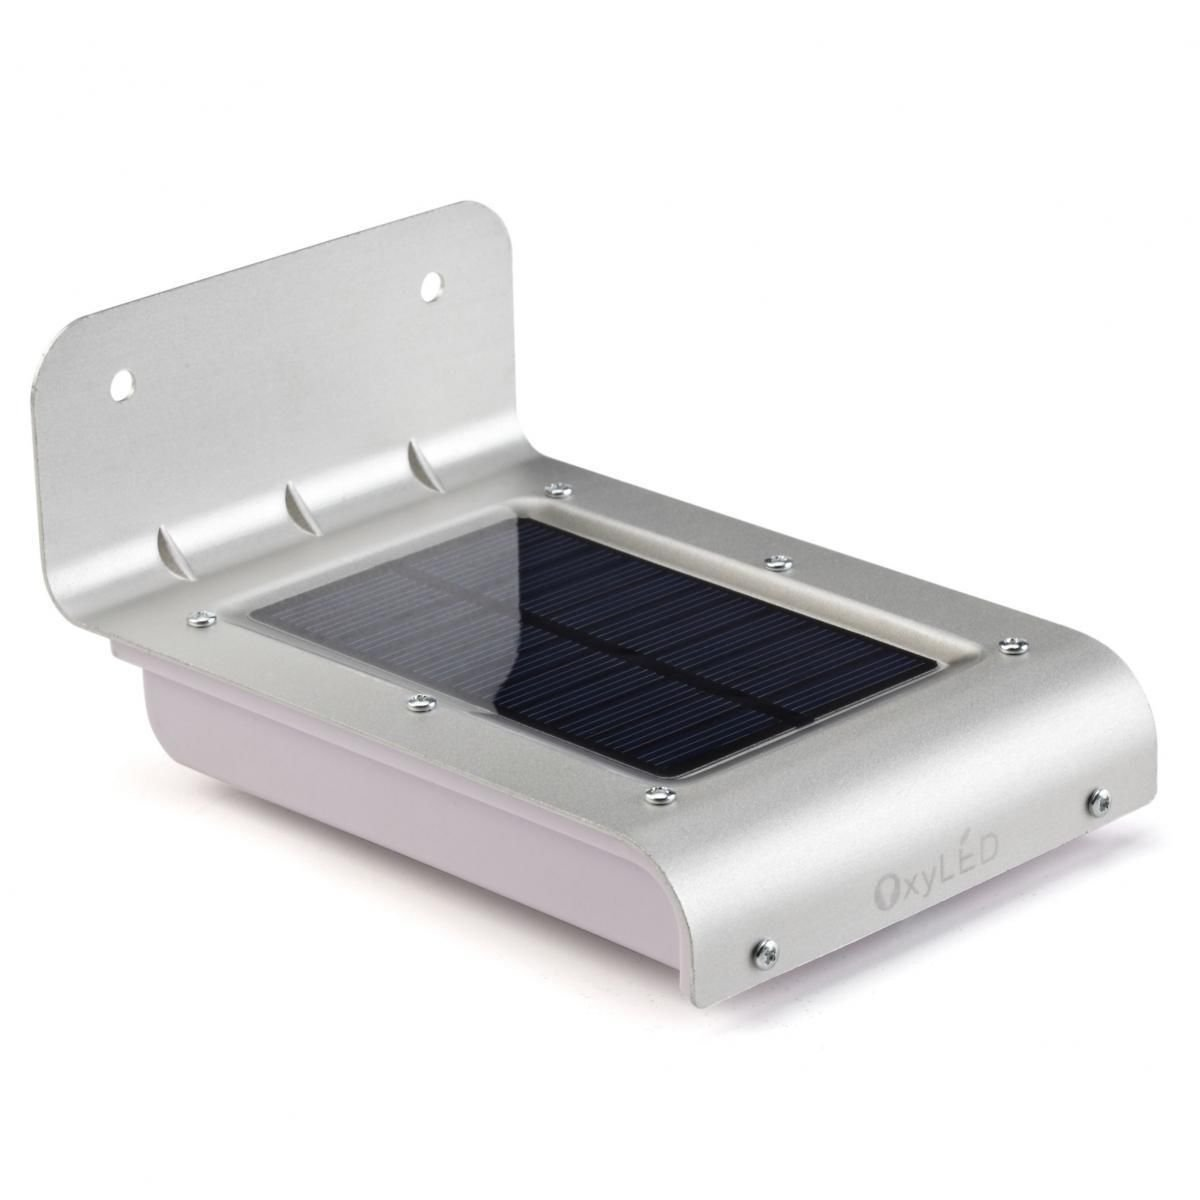 New LED Solar Powered Motion Sensor Outdoor Wall-Mounted Light Lamp Waterproof